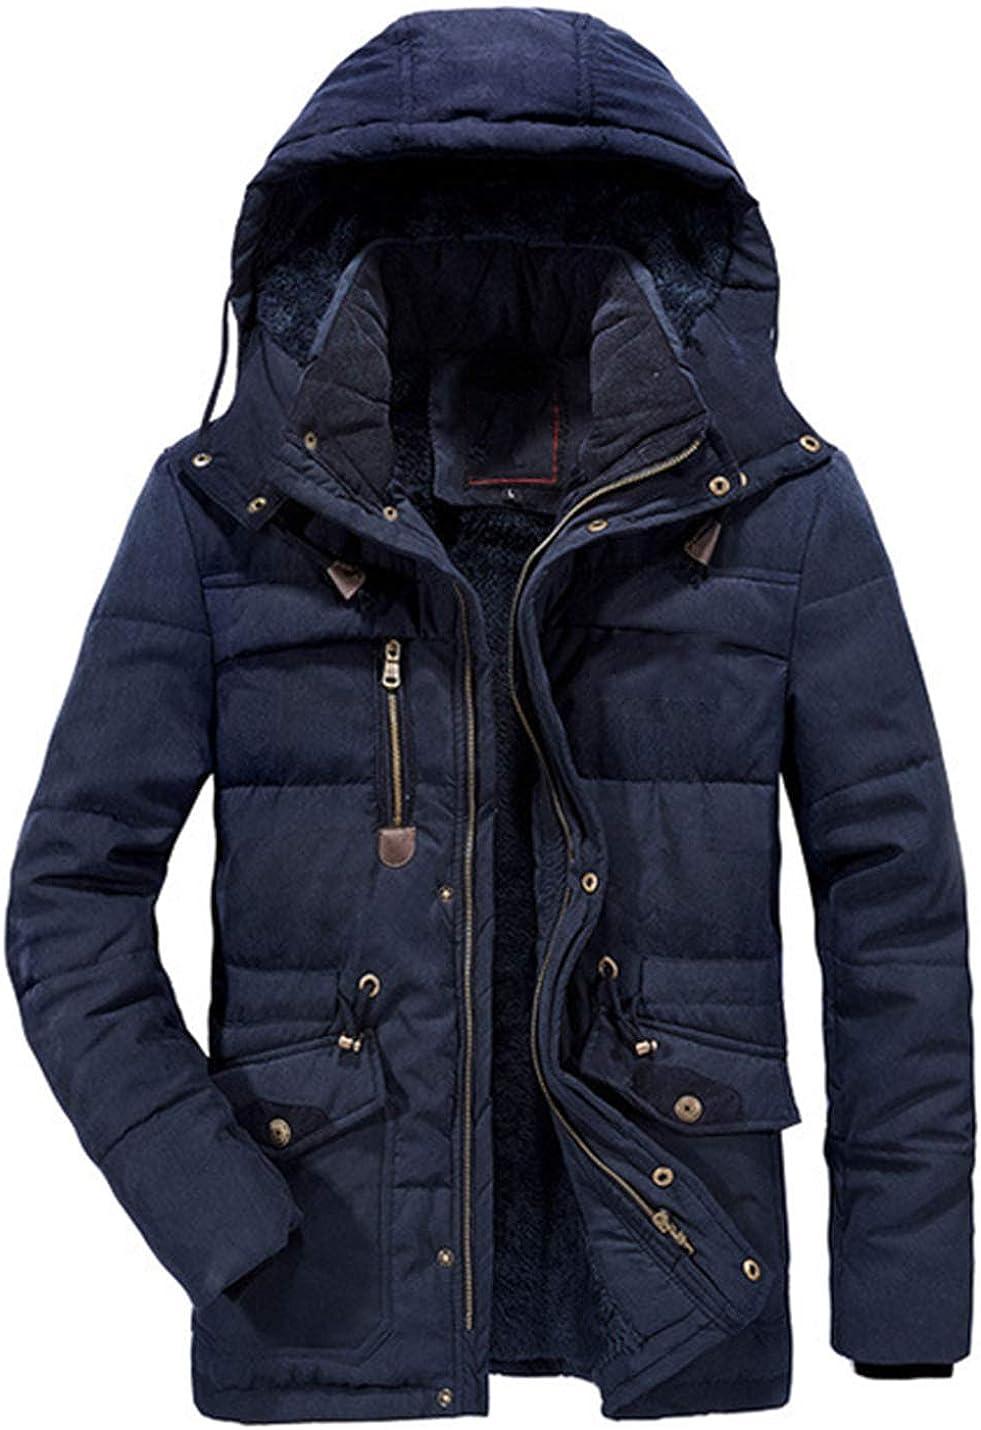 Uaneo Mens Casual Loose Thick Detachable Hood Fleece Sherpa Lined Chuncky Parka Jackets(Blue-XS)